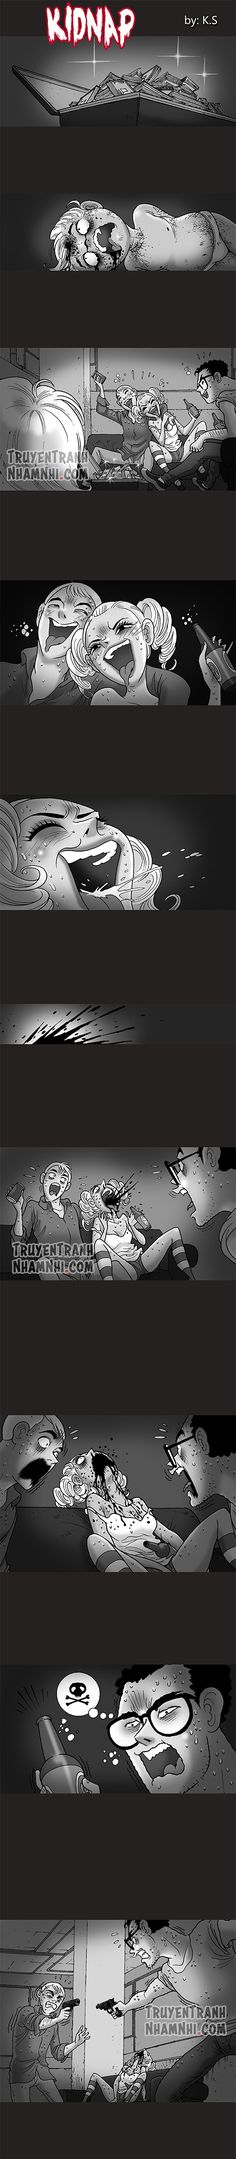 Silent Horror chap 181: Kidnap - Bắt cóc